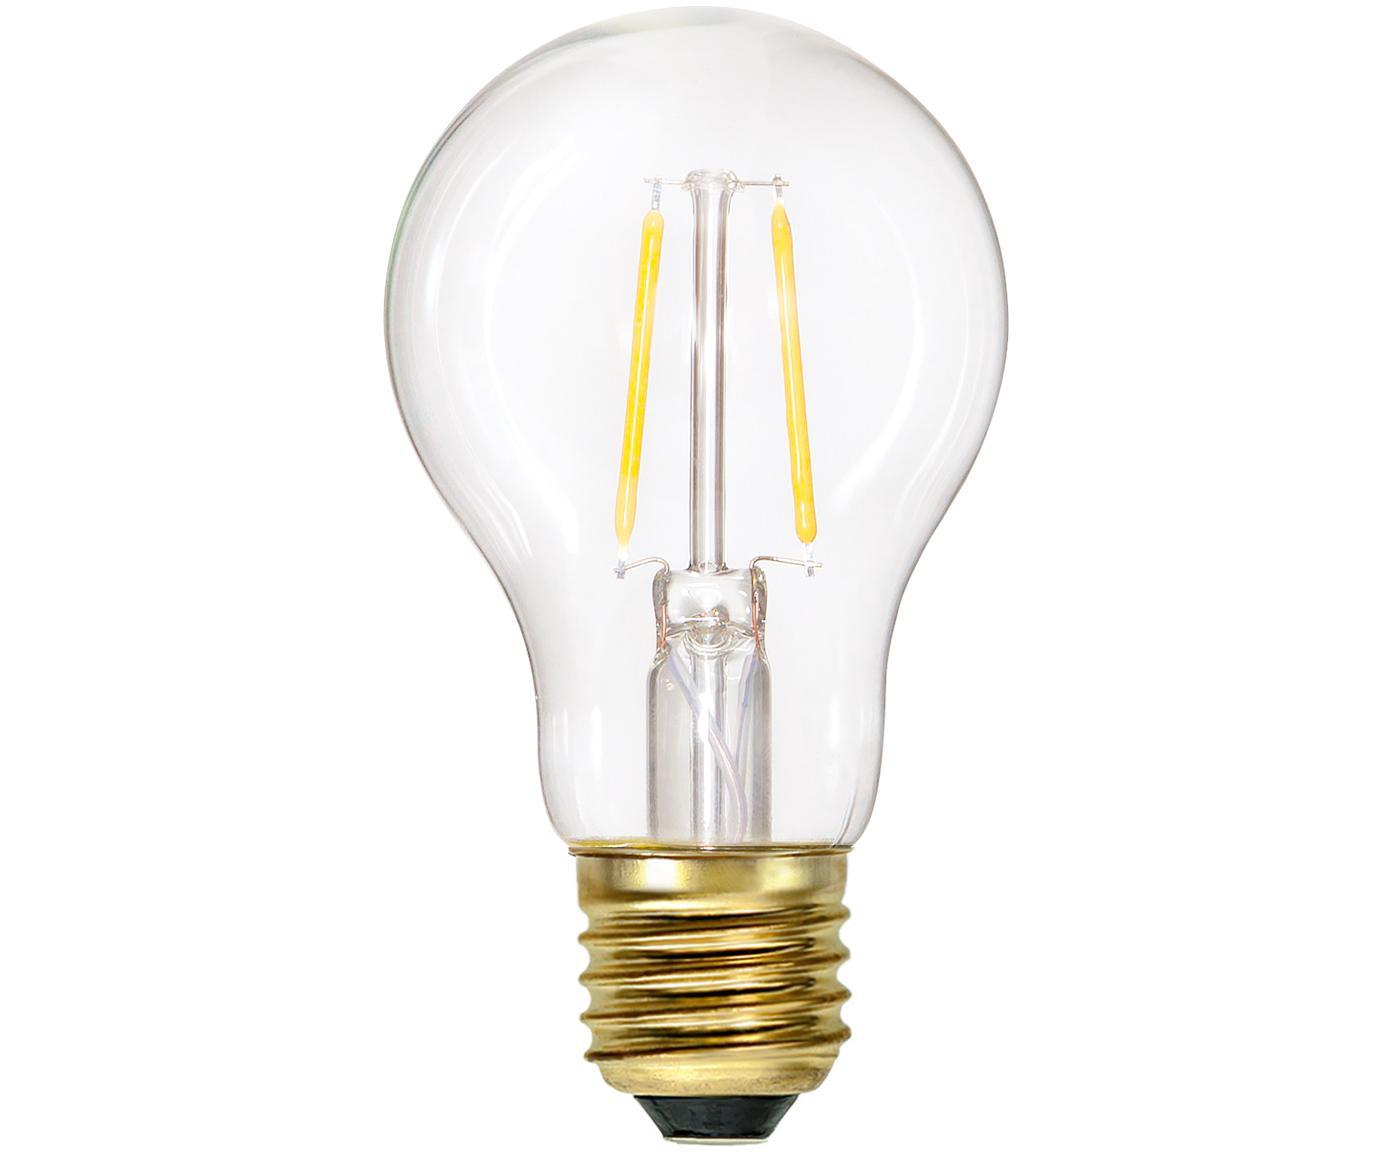 Żarówka LED Airtight Stream (E27/1.6W), Transparentny, mosiądz, Ø 6 x W 11 cm